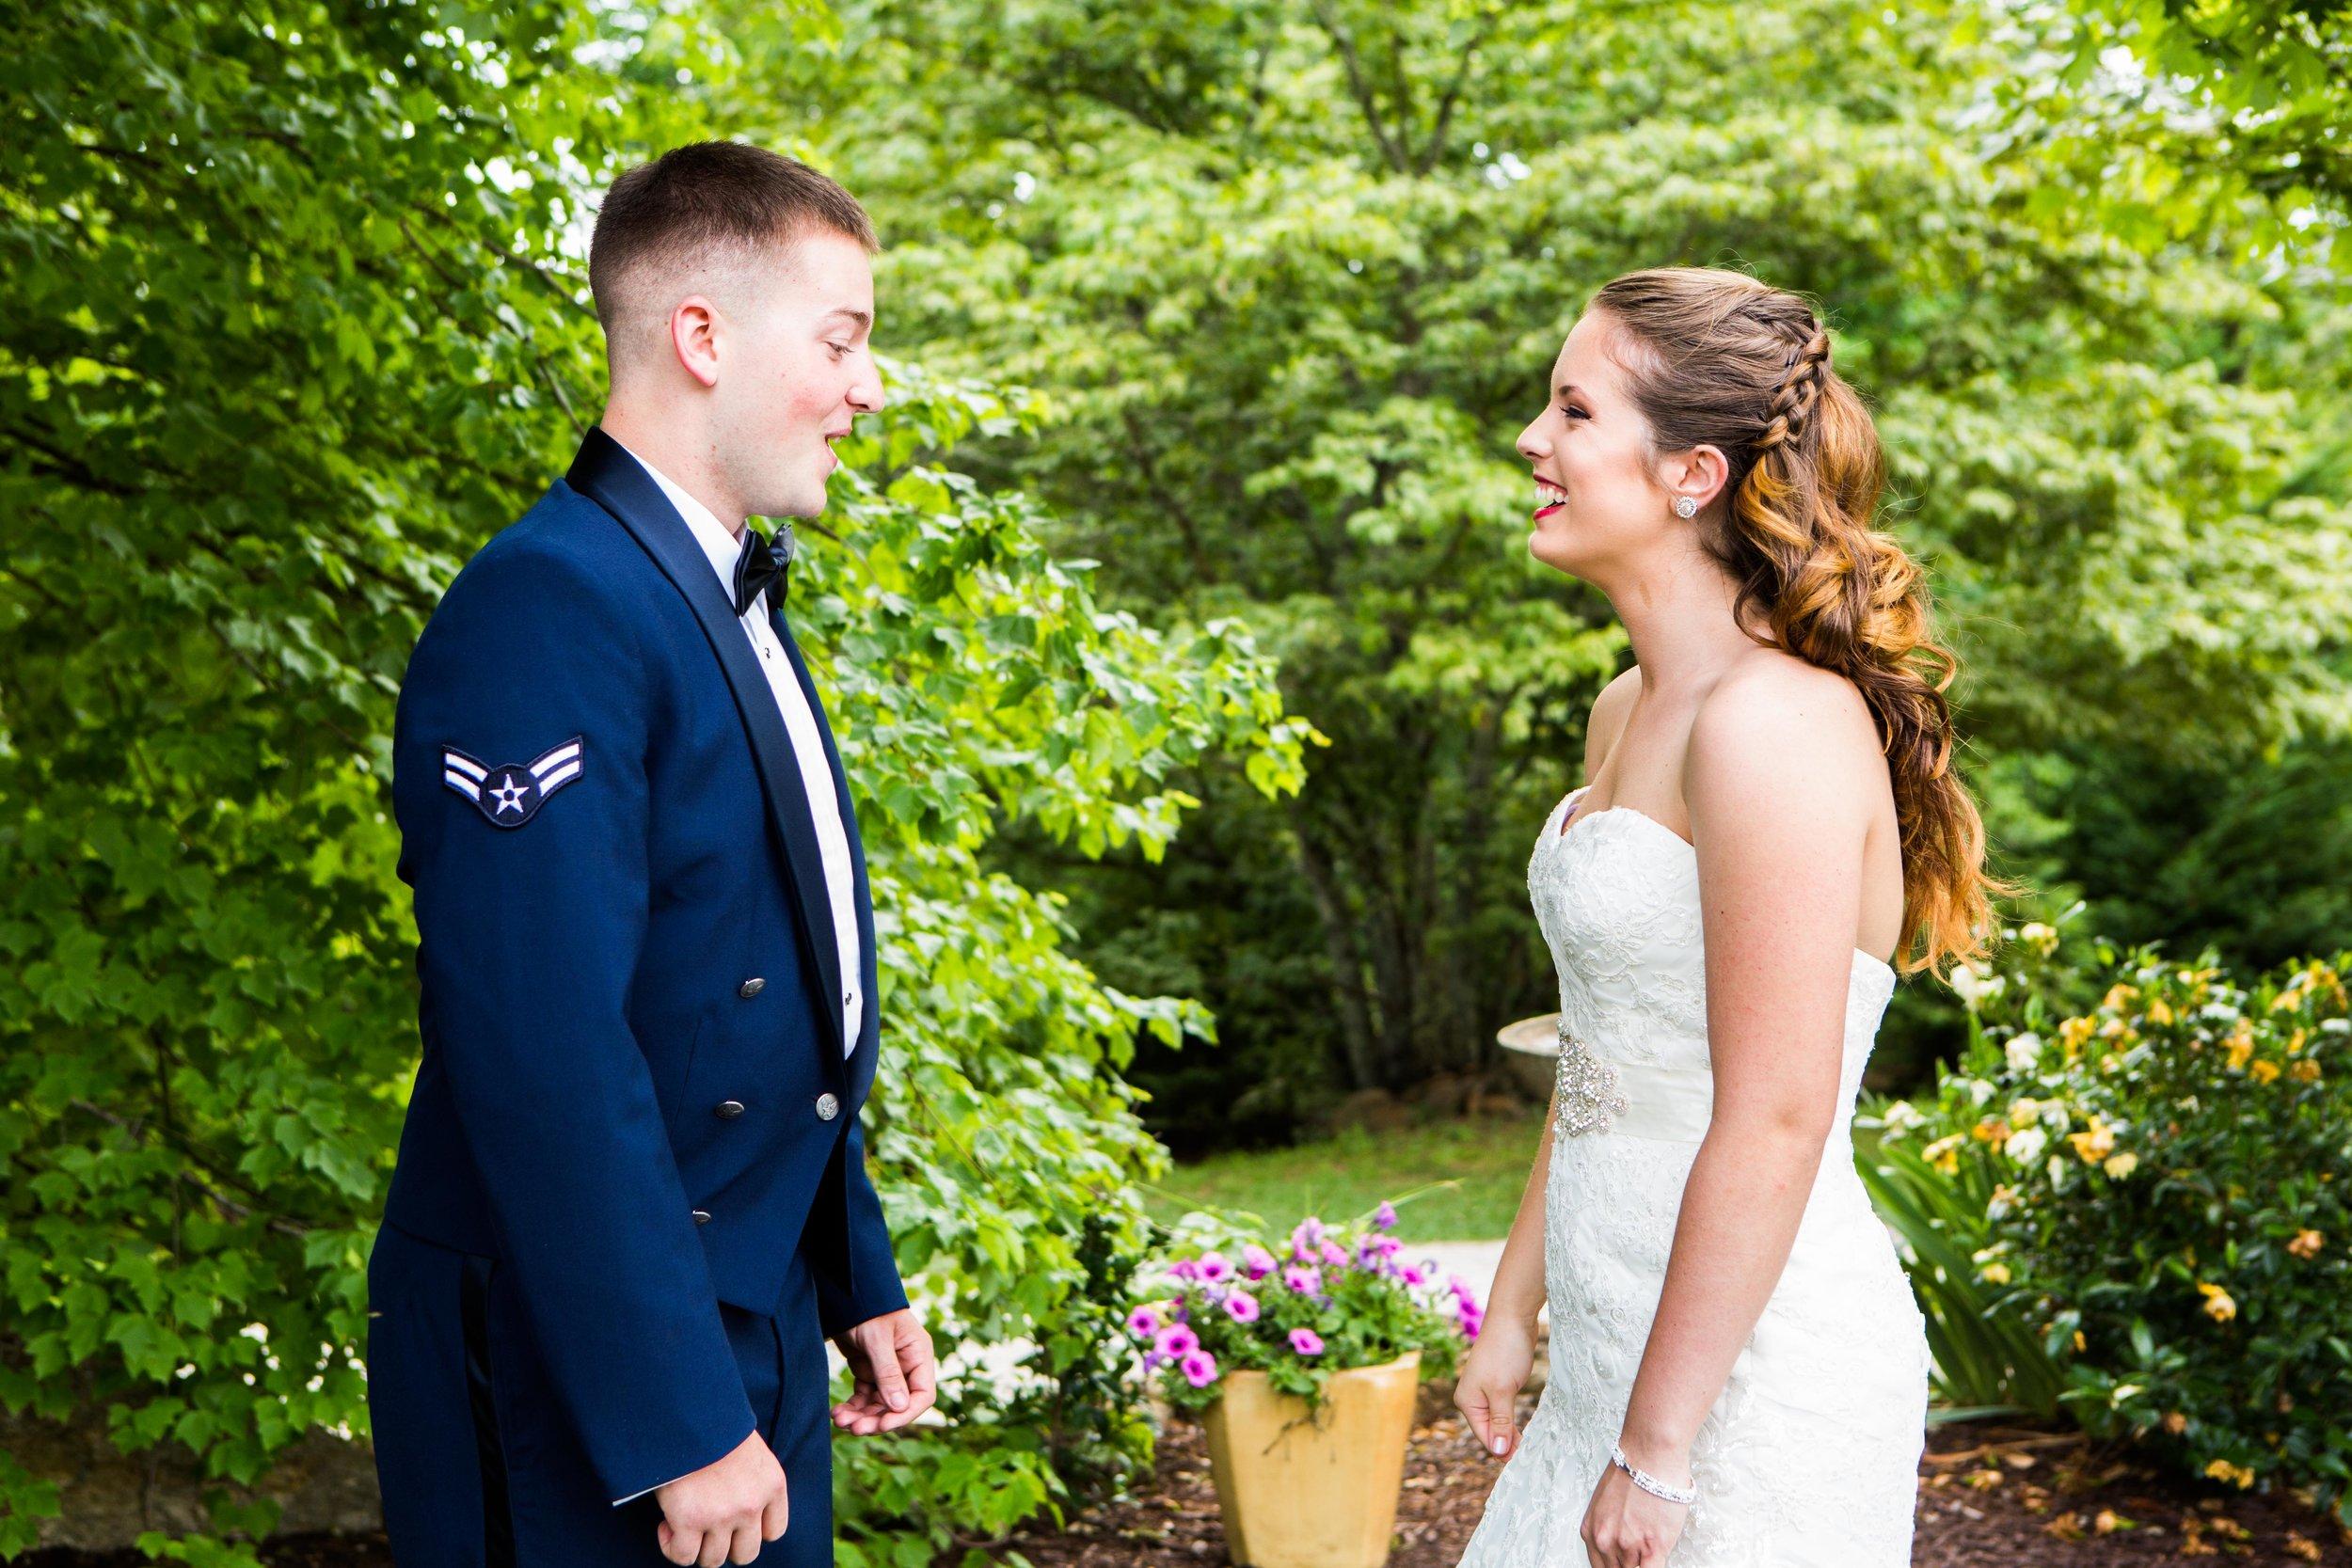 060416_Norris_Smith_Wedding_CF_11214.jpg